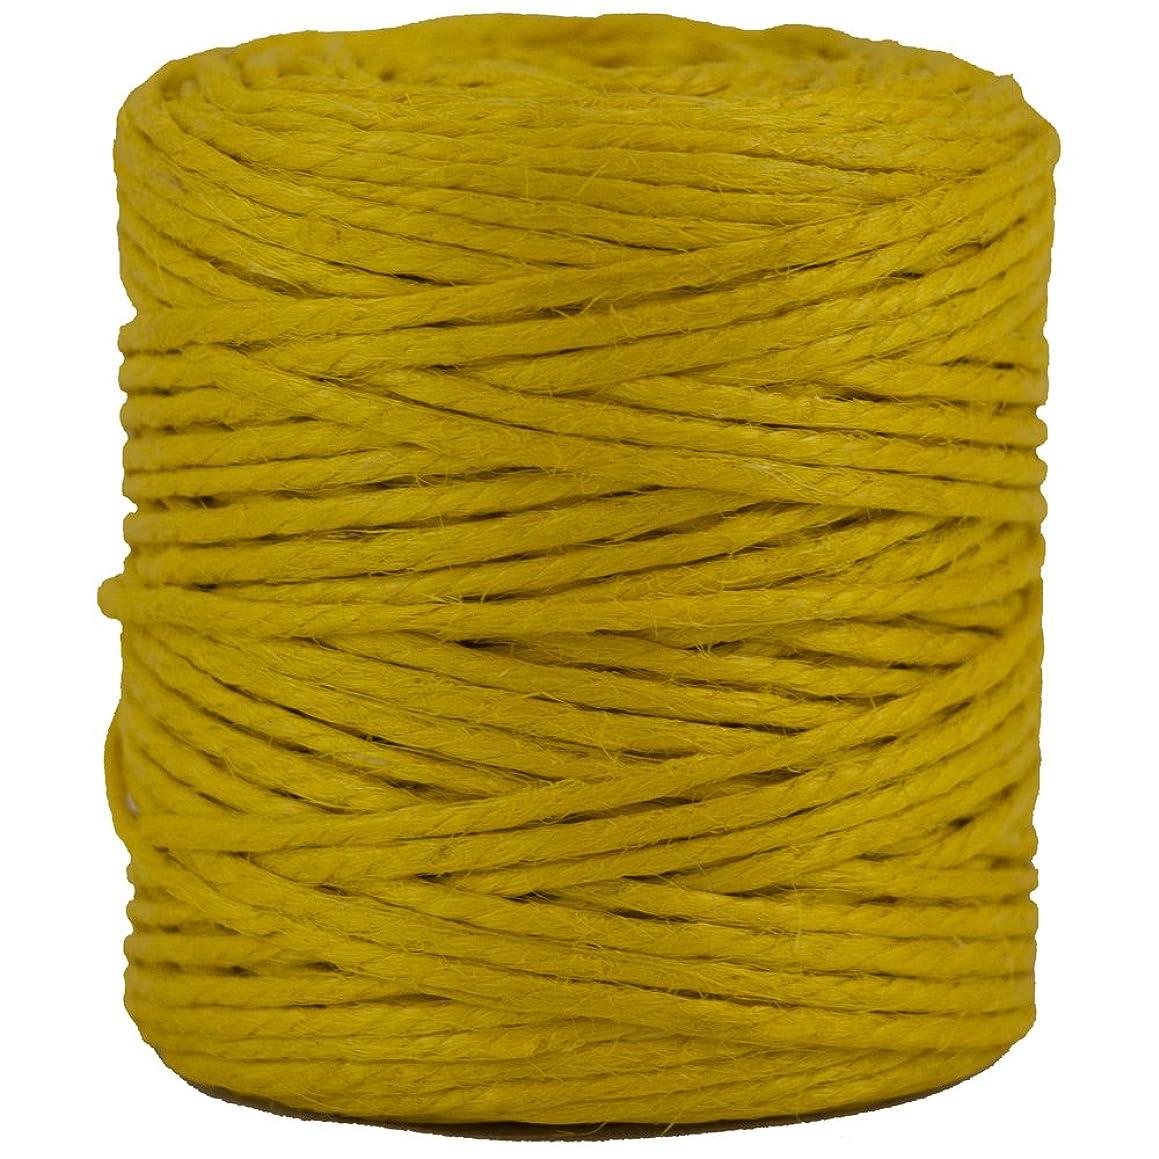 JAM PAPER Kraft Twine - 1/8 x 73 yards - Yellow - Sold Individually